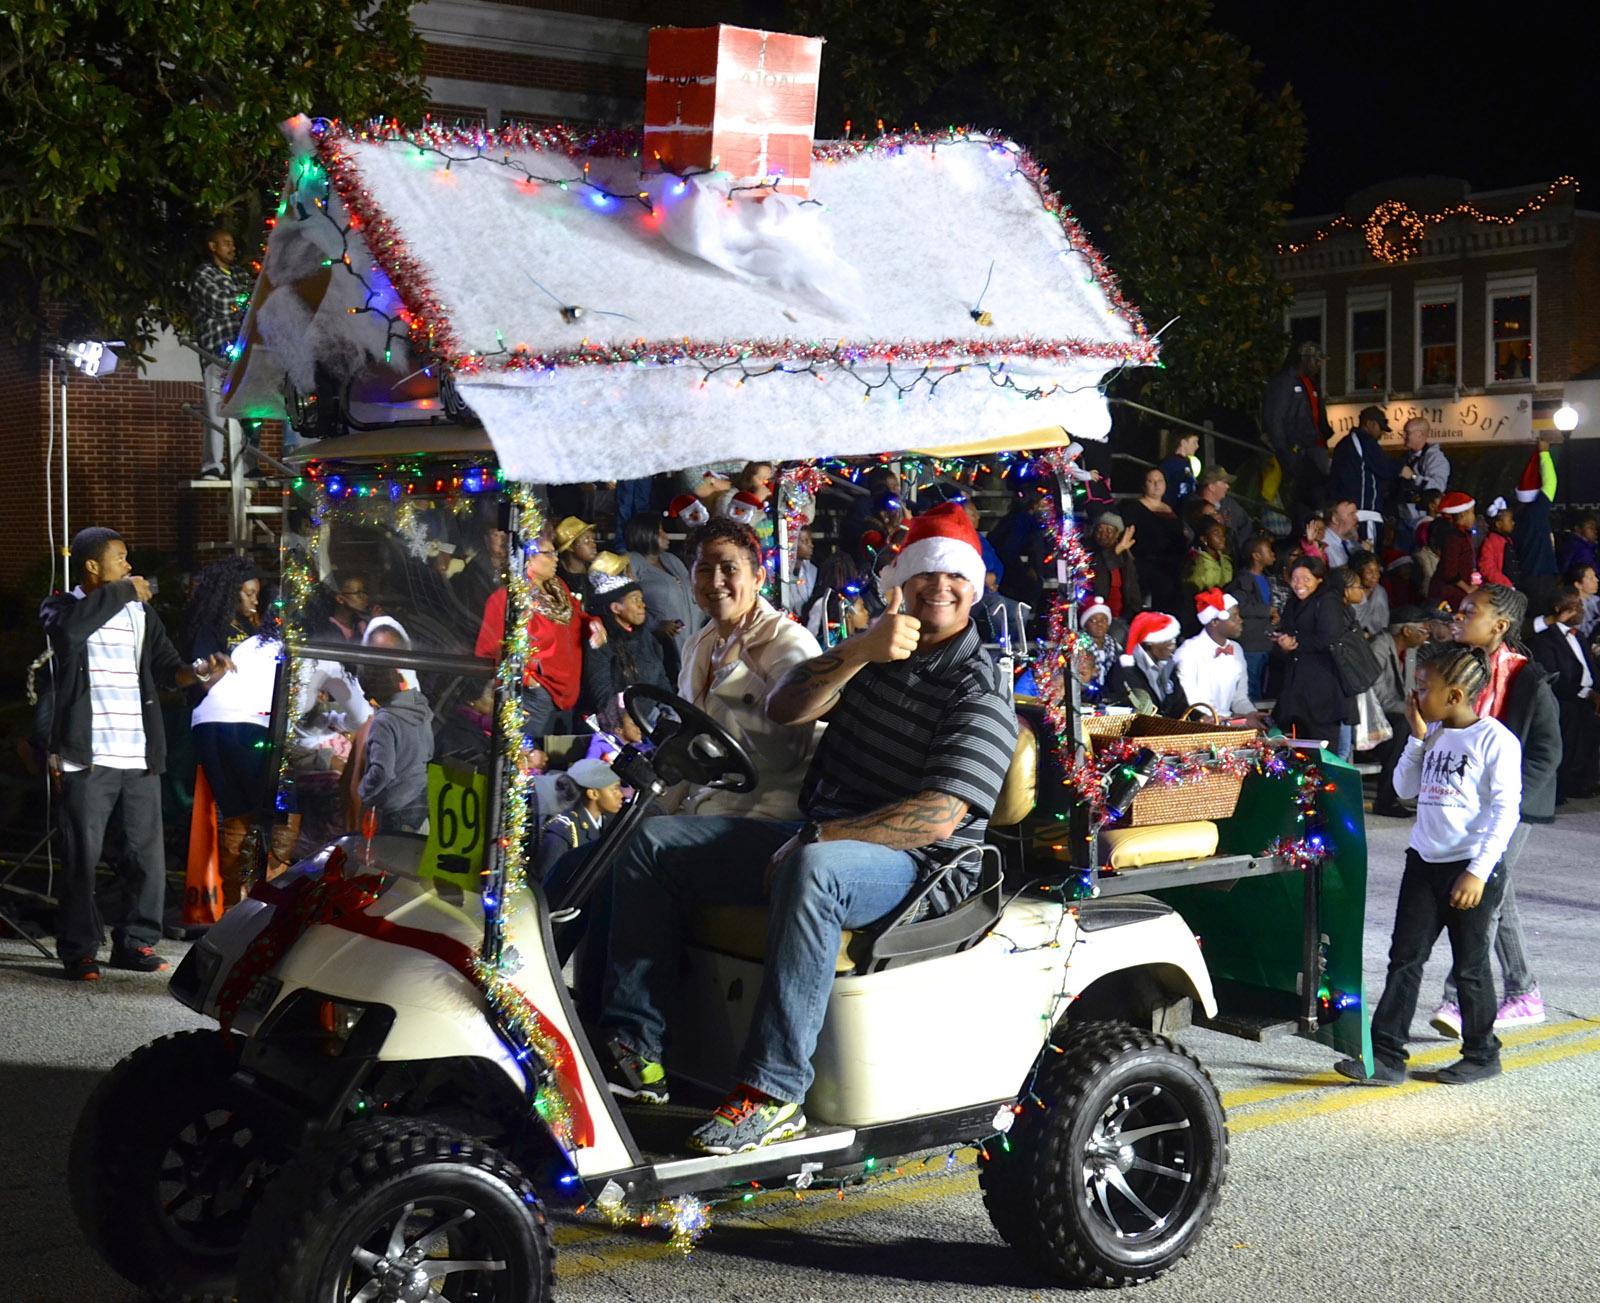 Valdosta Ga Christmas Parade 2019 Jingle All the Way with Georgia's Christmas Parades | Official